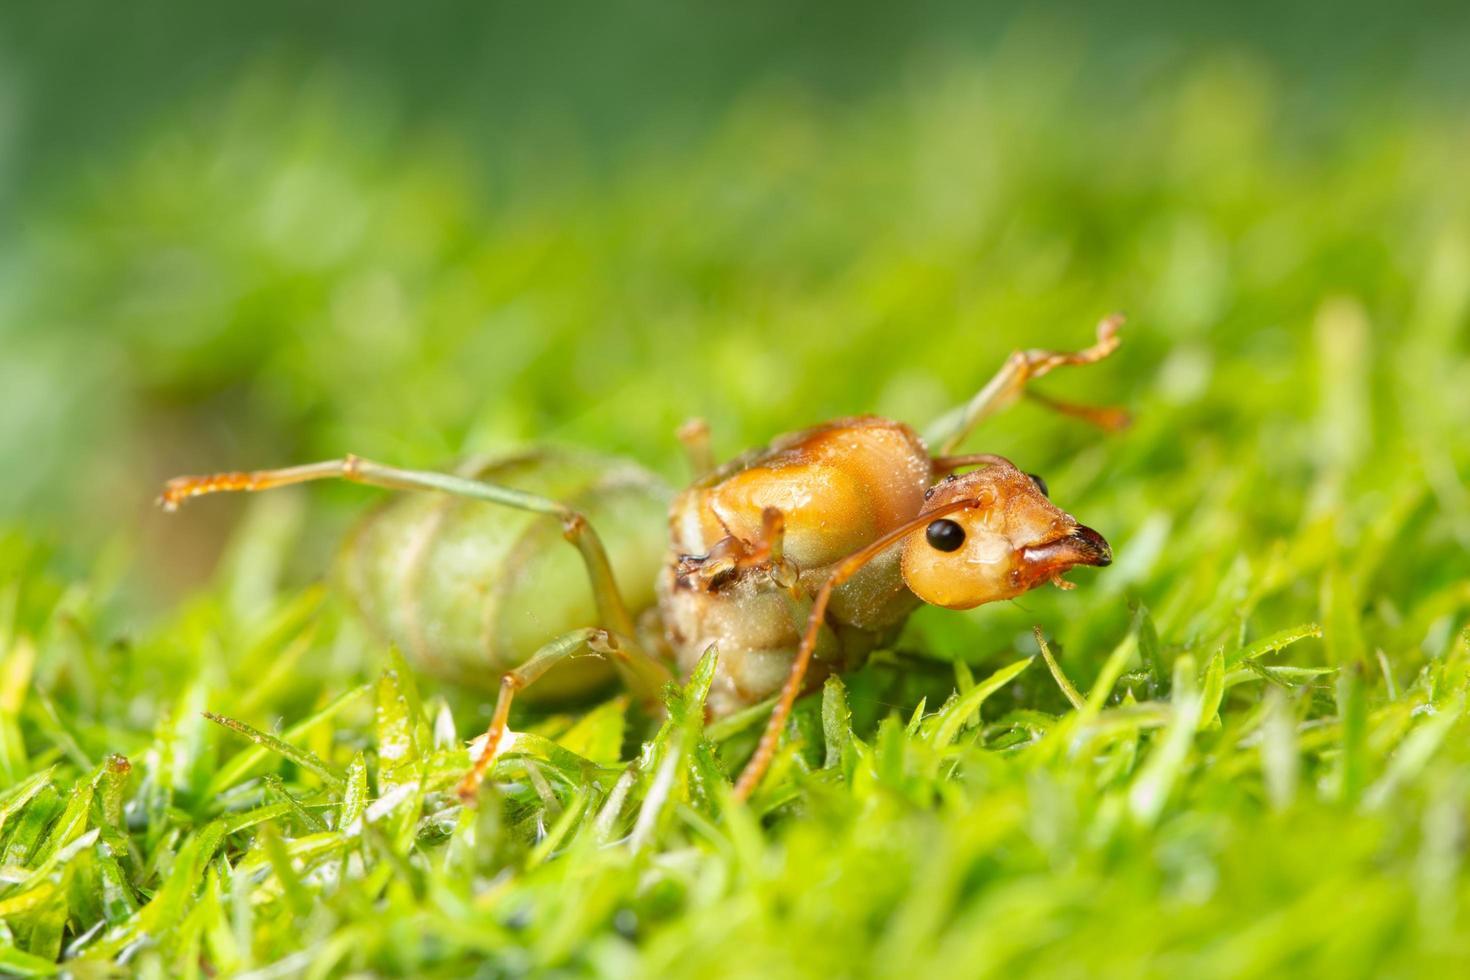 Macro Ants on Plants photo